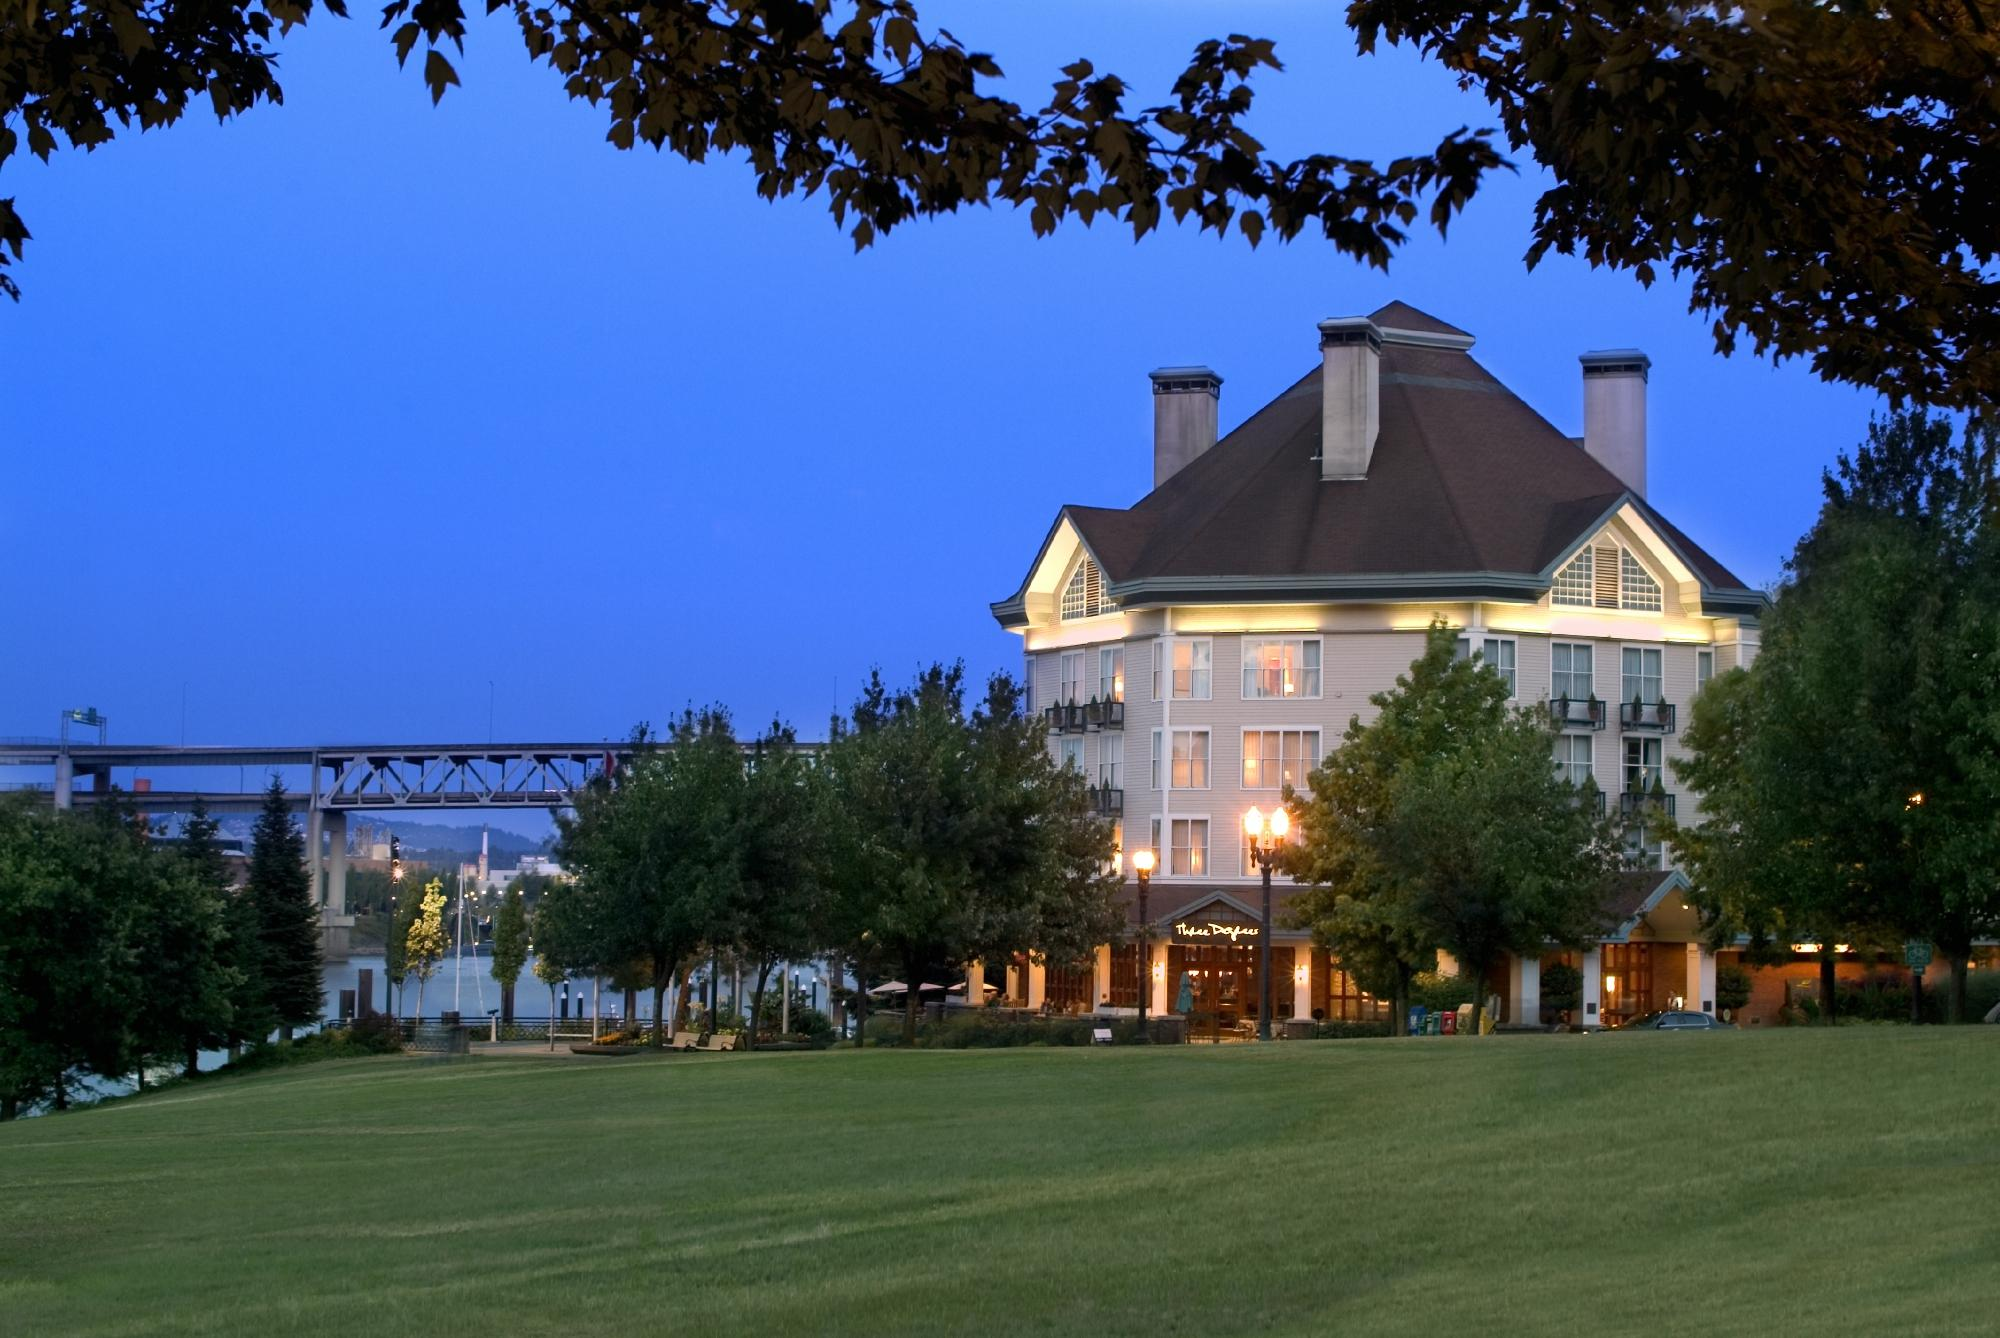 RiverPlace Hotel, a Kimpton Hotel